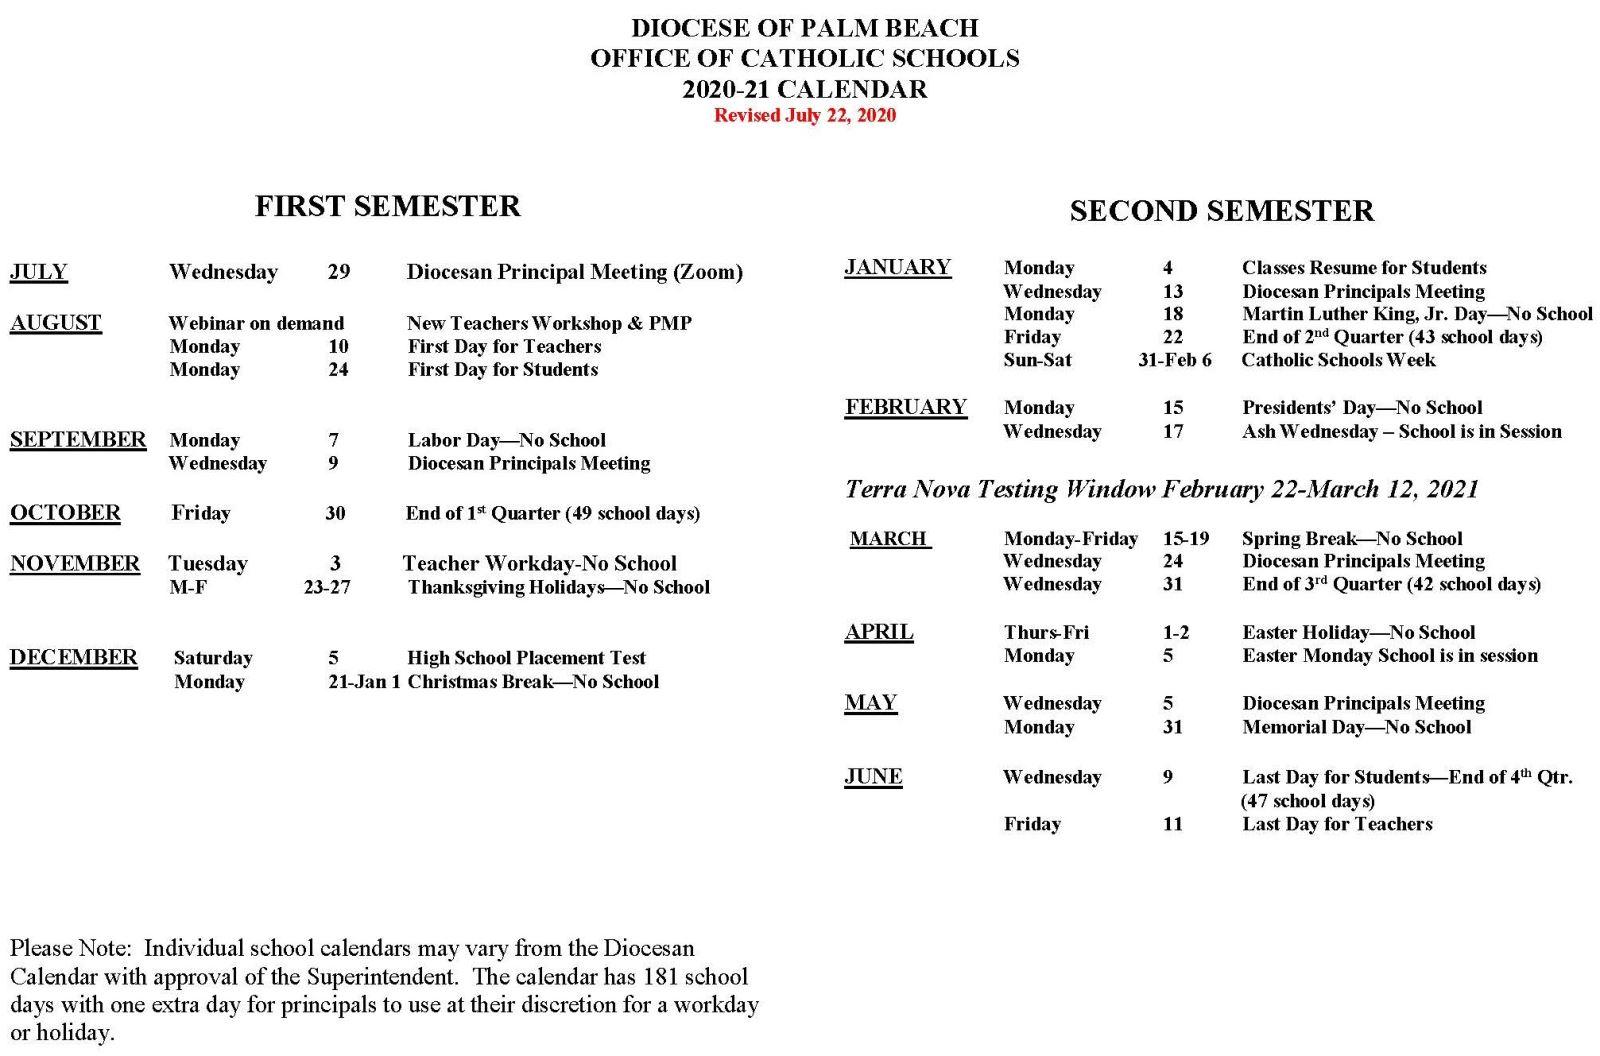 School Calendar | Diocese Of Palm Beach Catholic Schools Regarding Palm Beach State College School Calendar